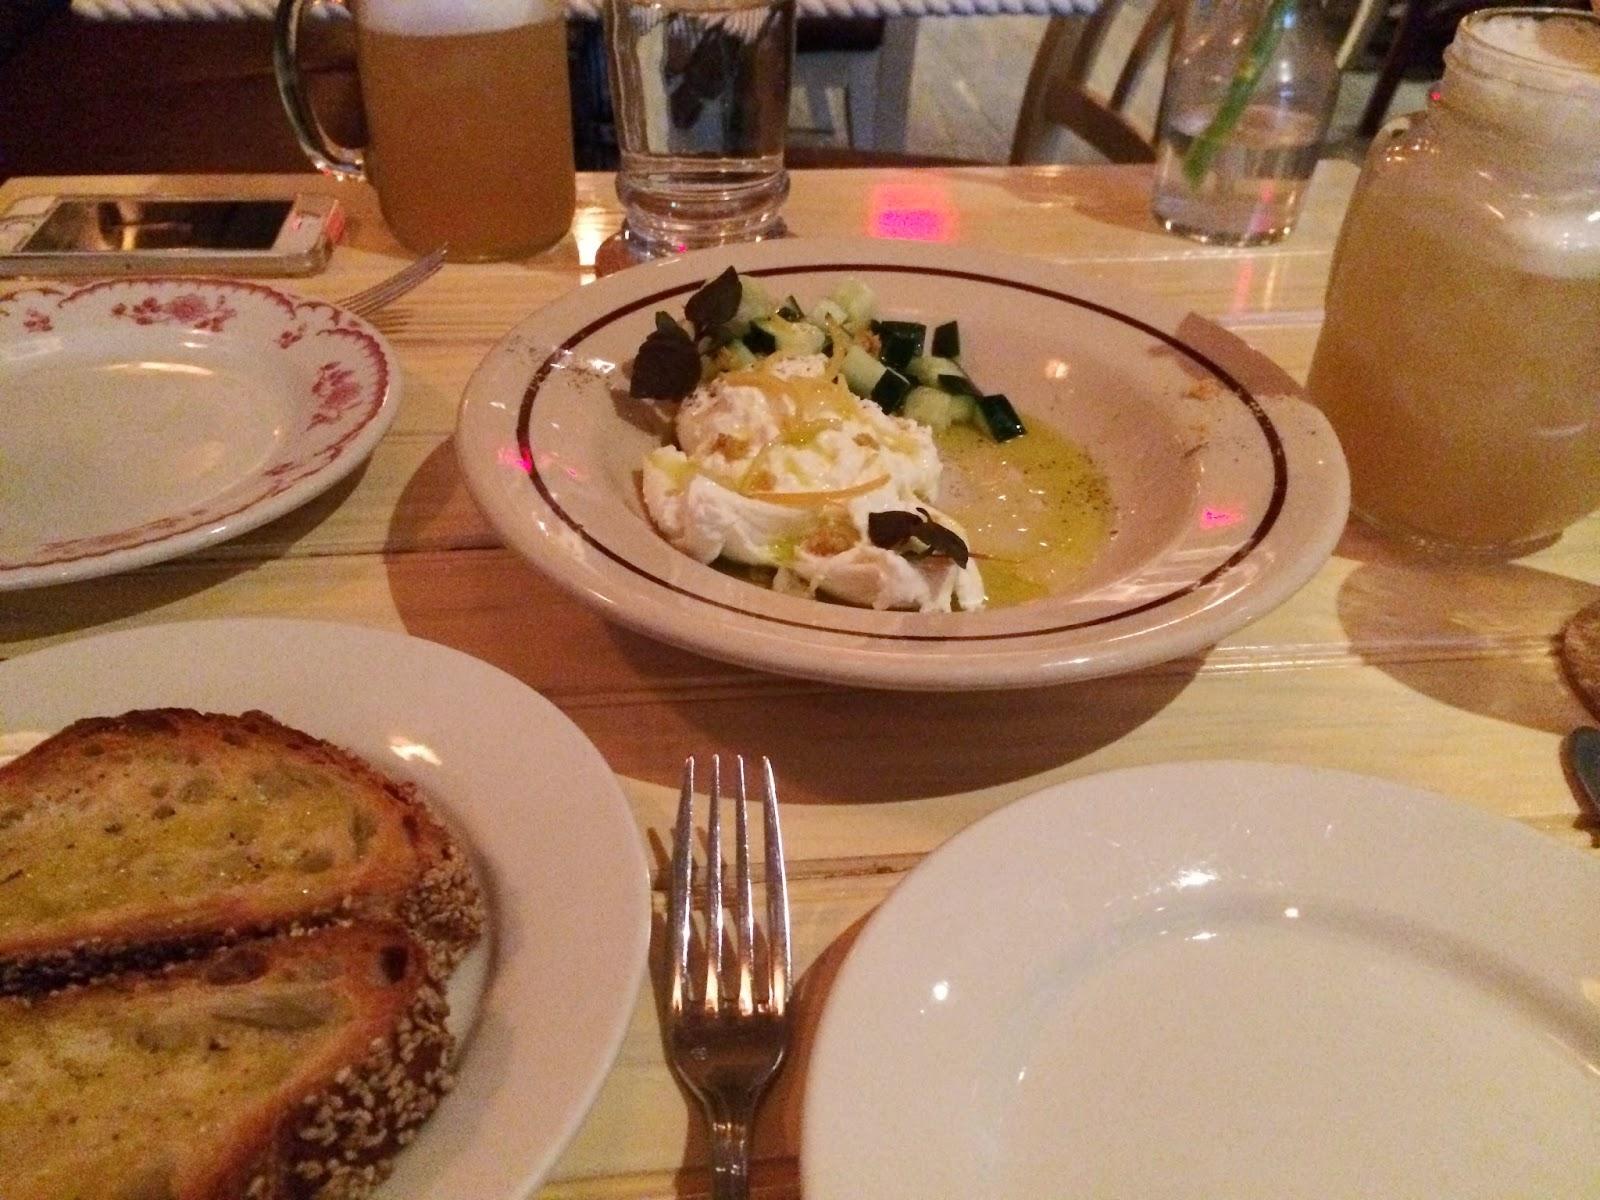 Chalk Point Kitchen, NYC, SoHo, eating fabulously, Matt Levine, Christopher Stewart, burrata